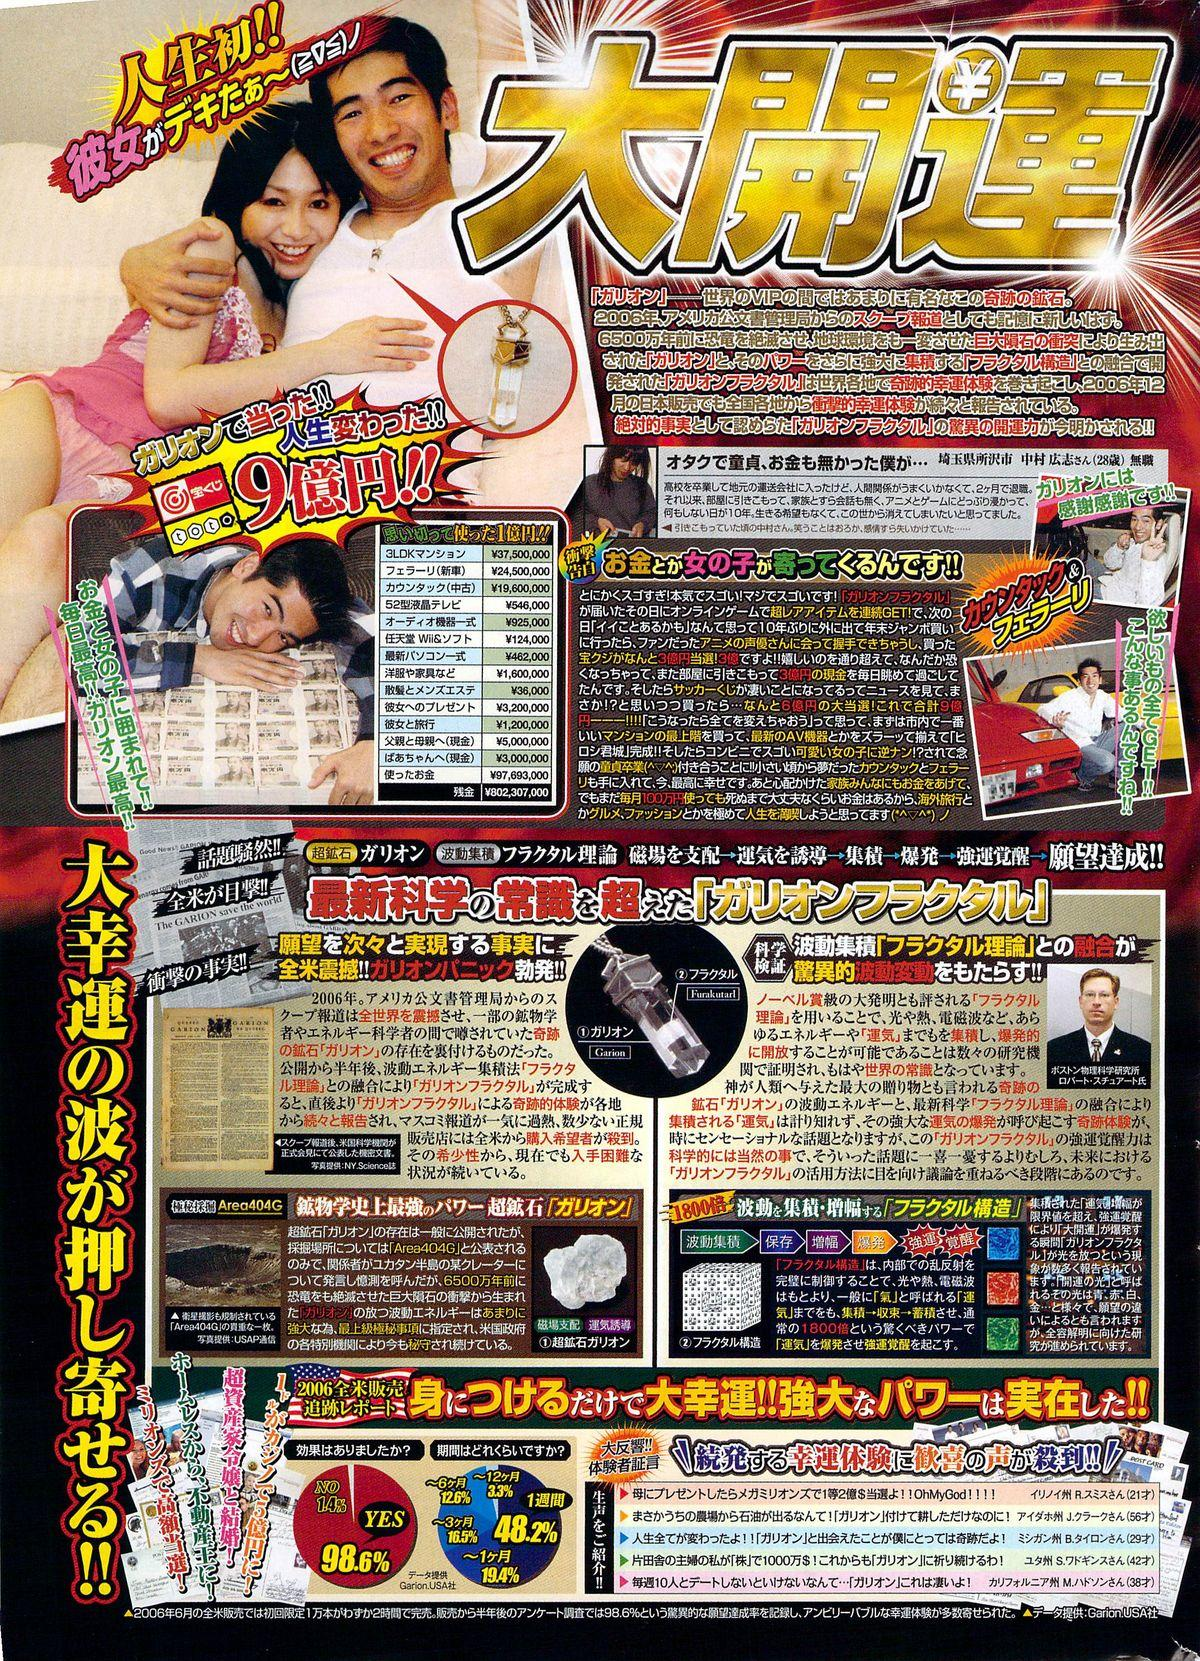 Monthly Vitaman 2009-08 303